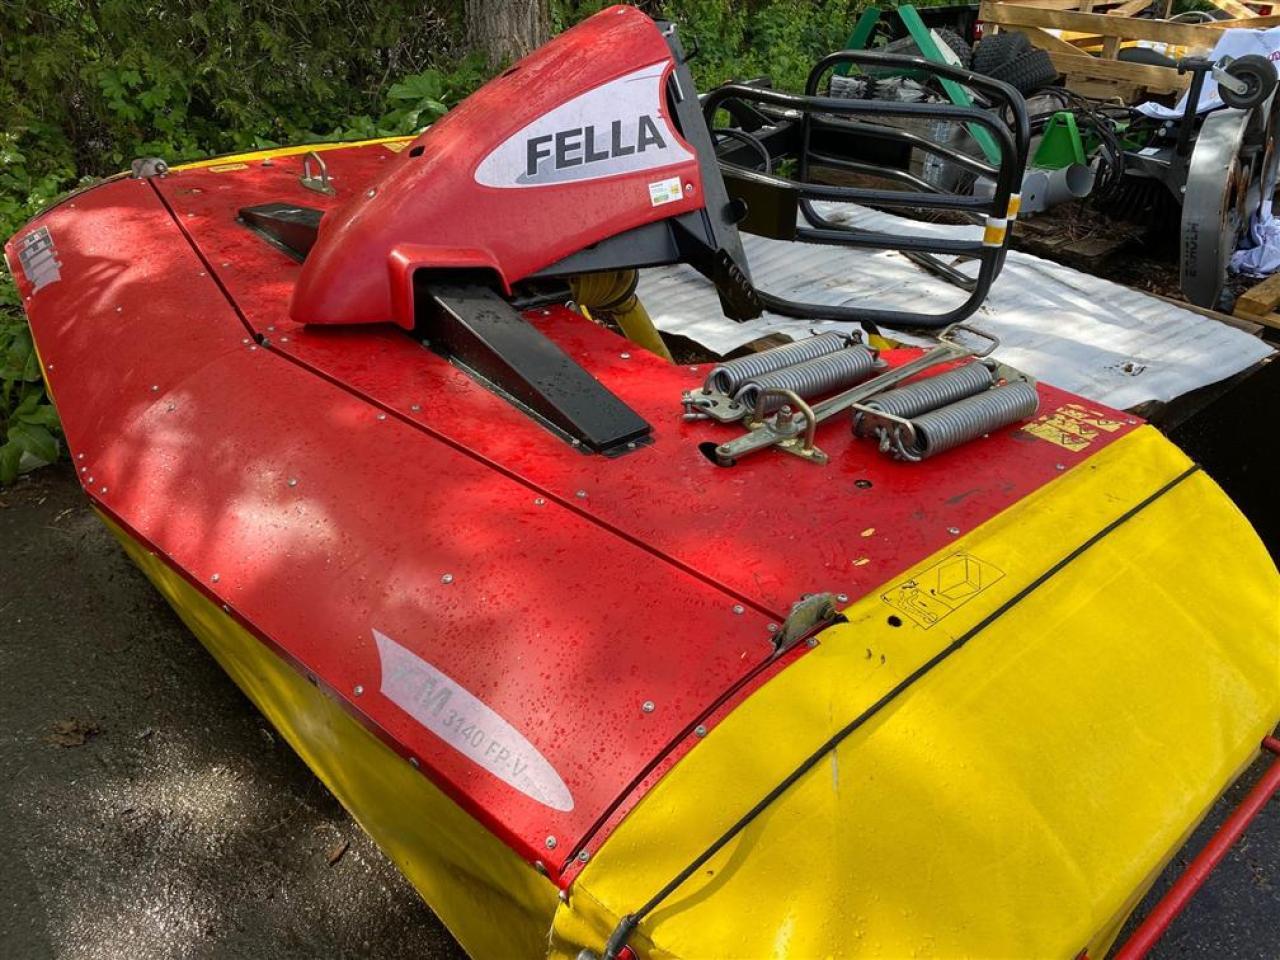 Fella KM3140 FP-V